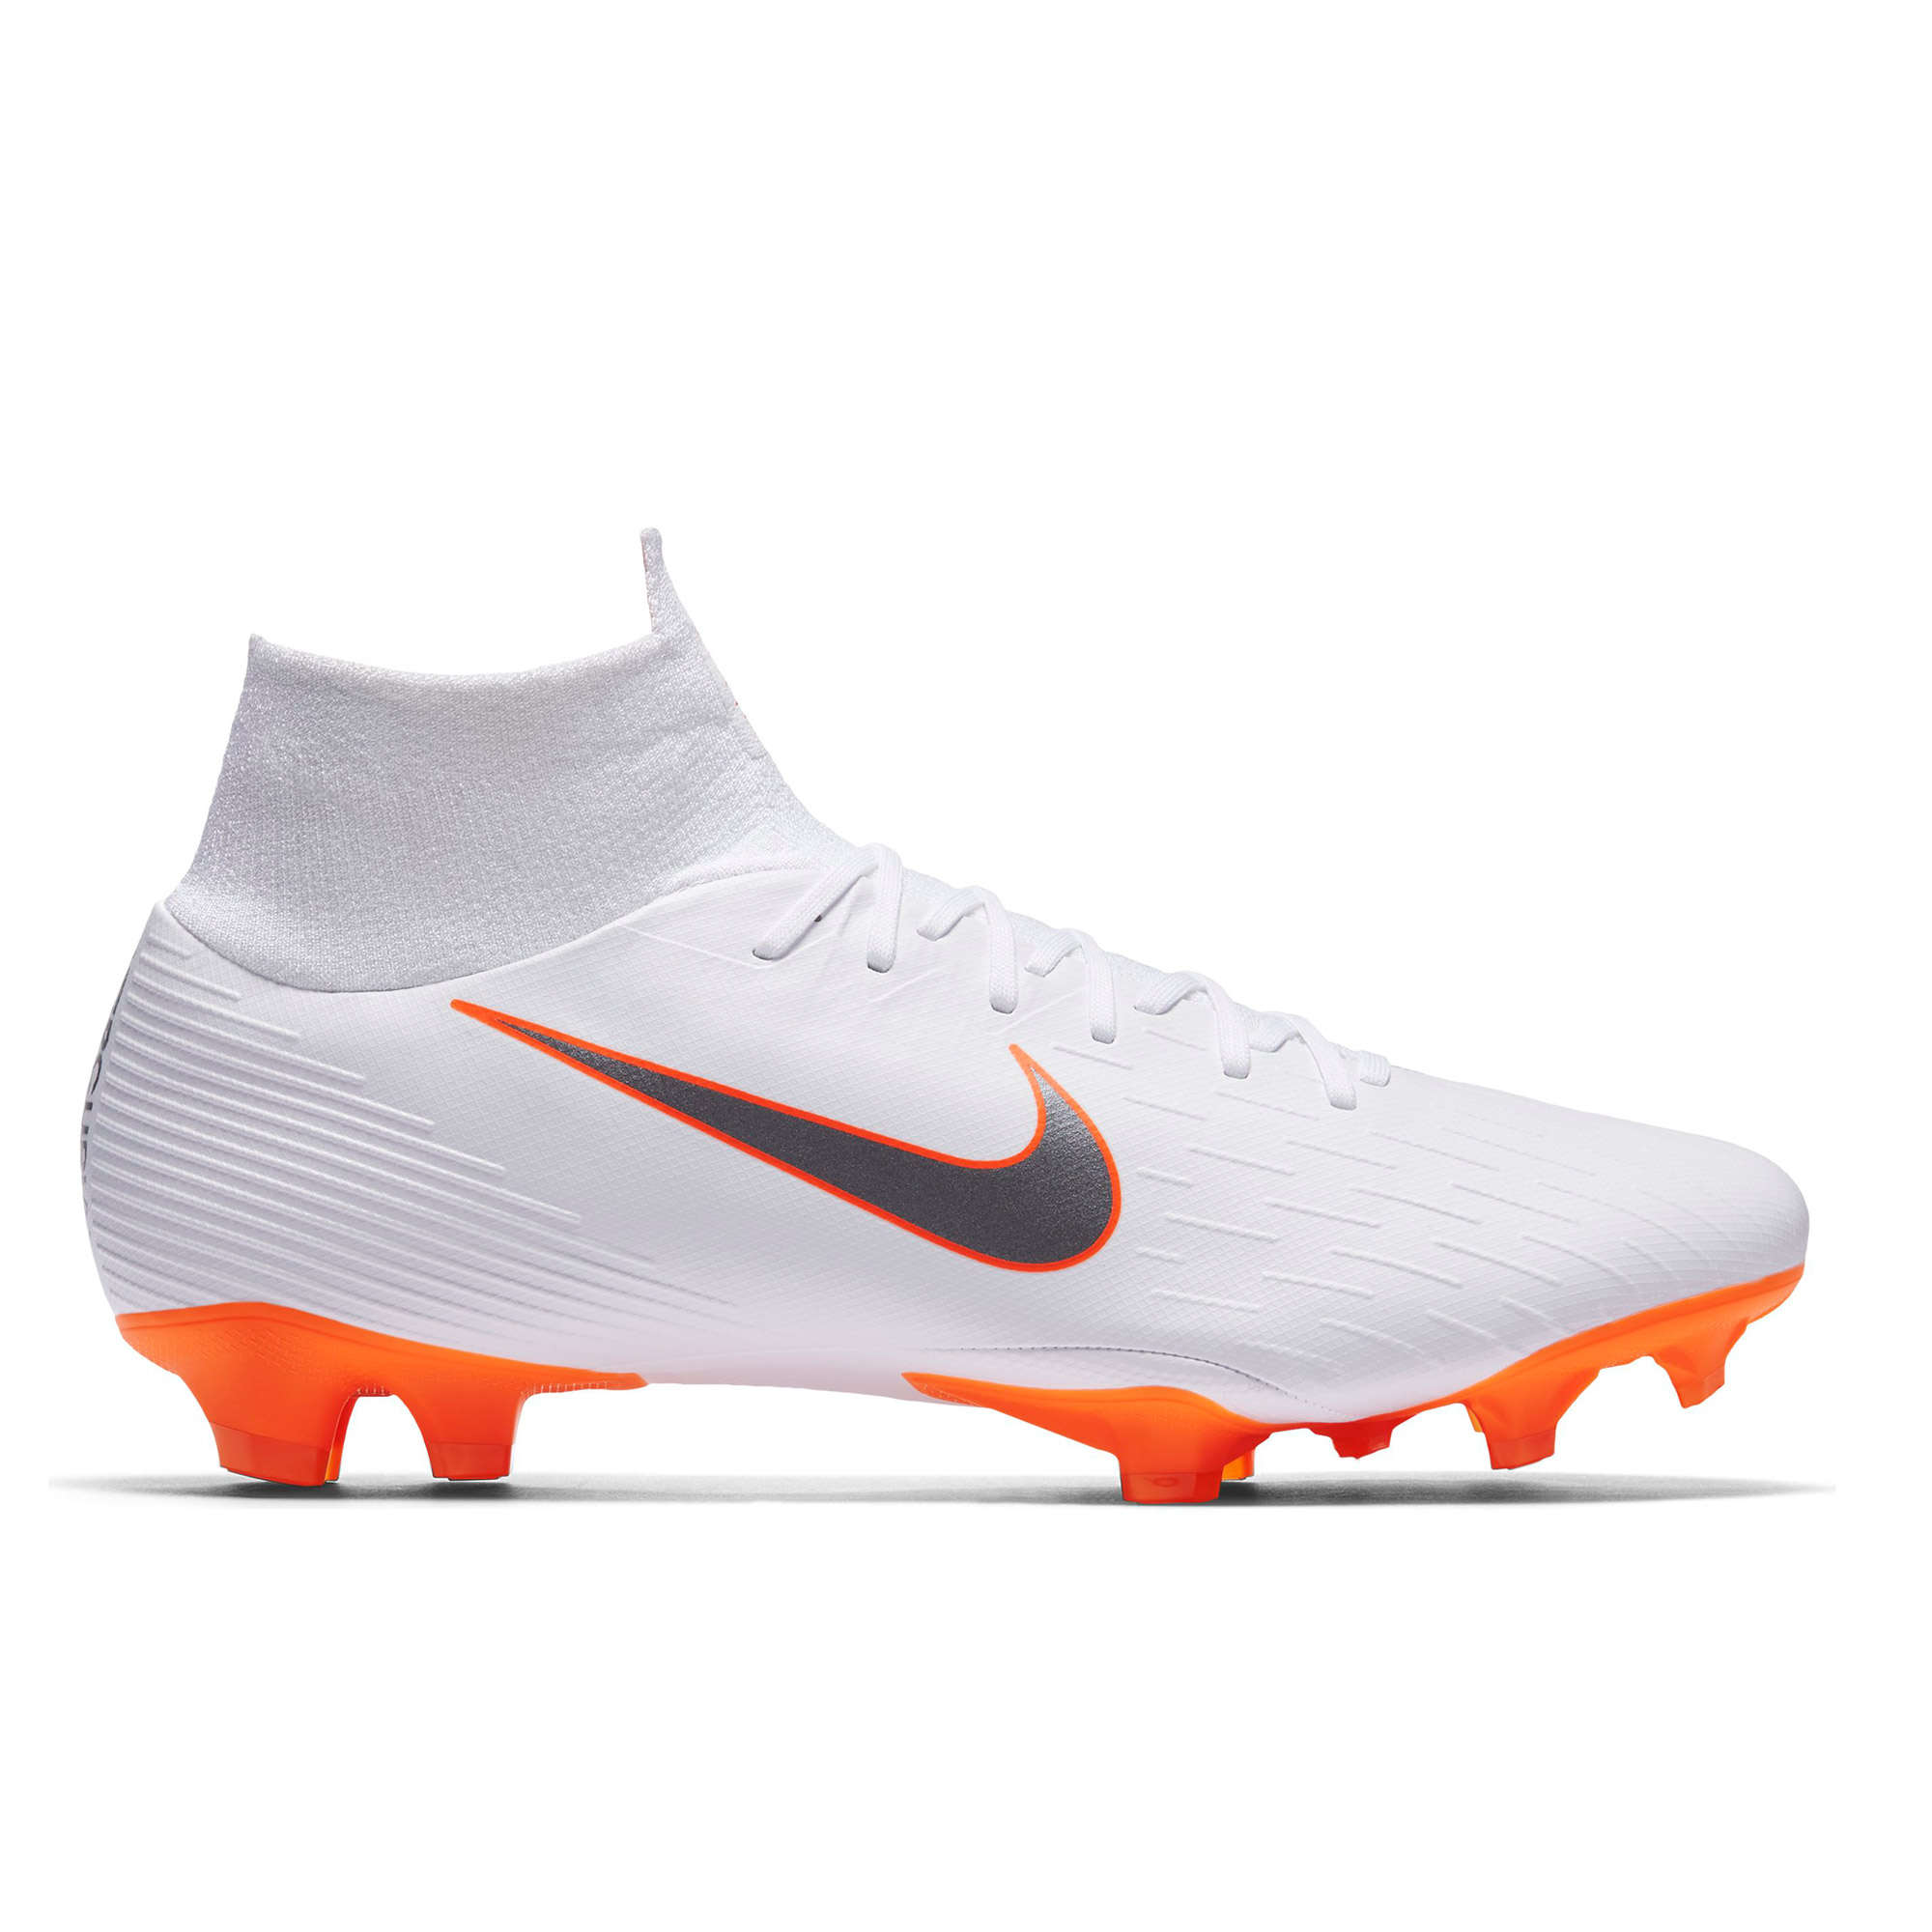 Chaussures de football Nike Mercurial Superfly6 Pro pour terrain sec